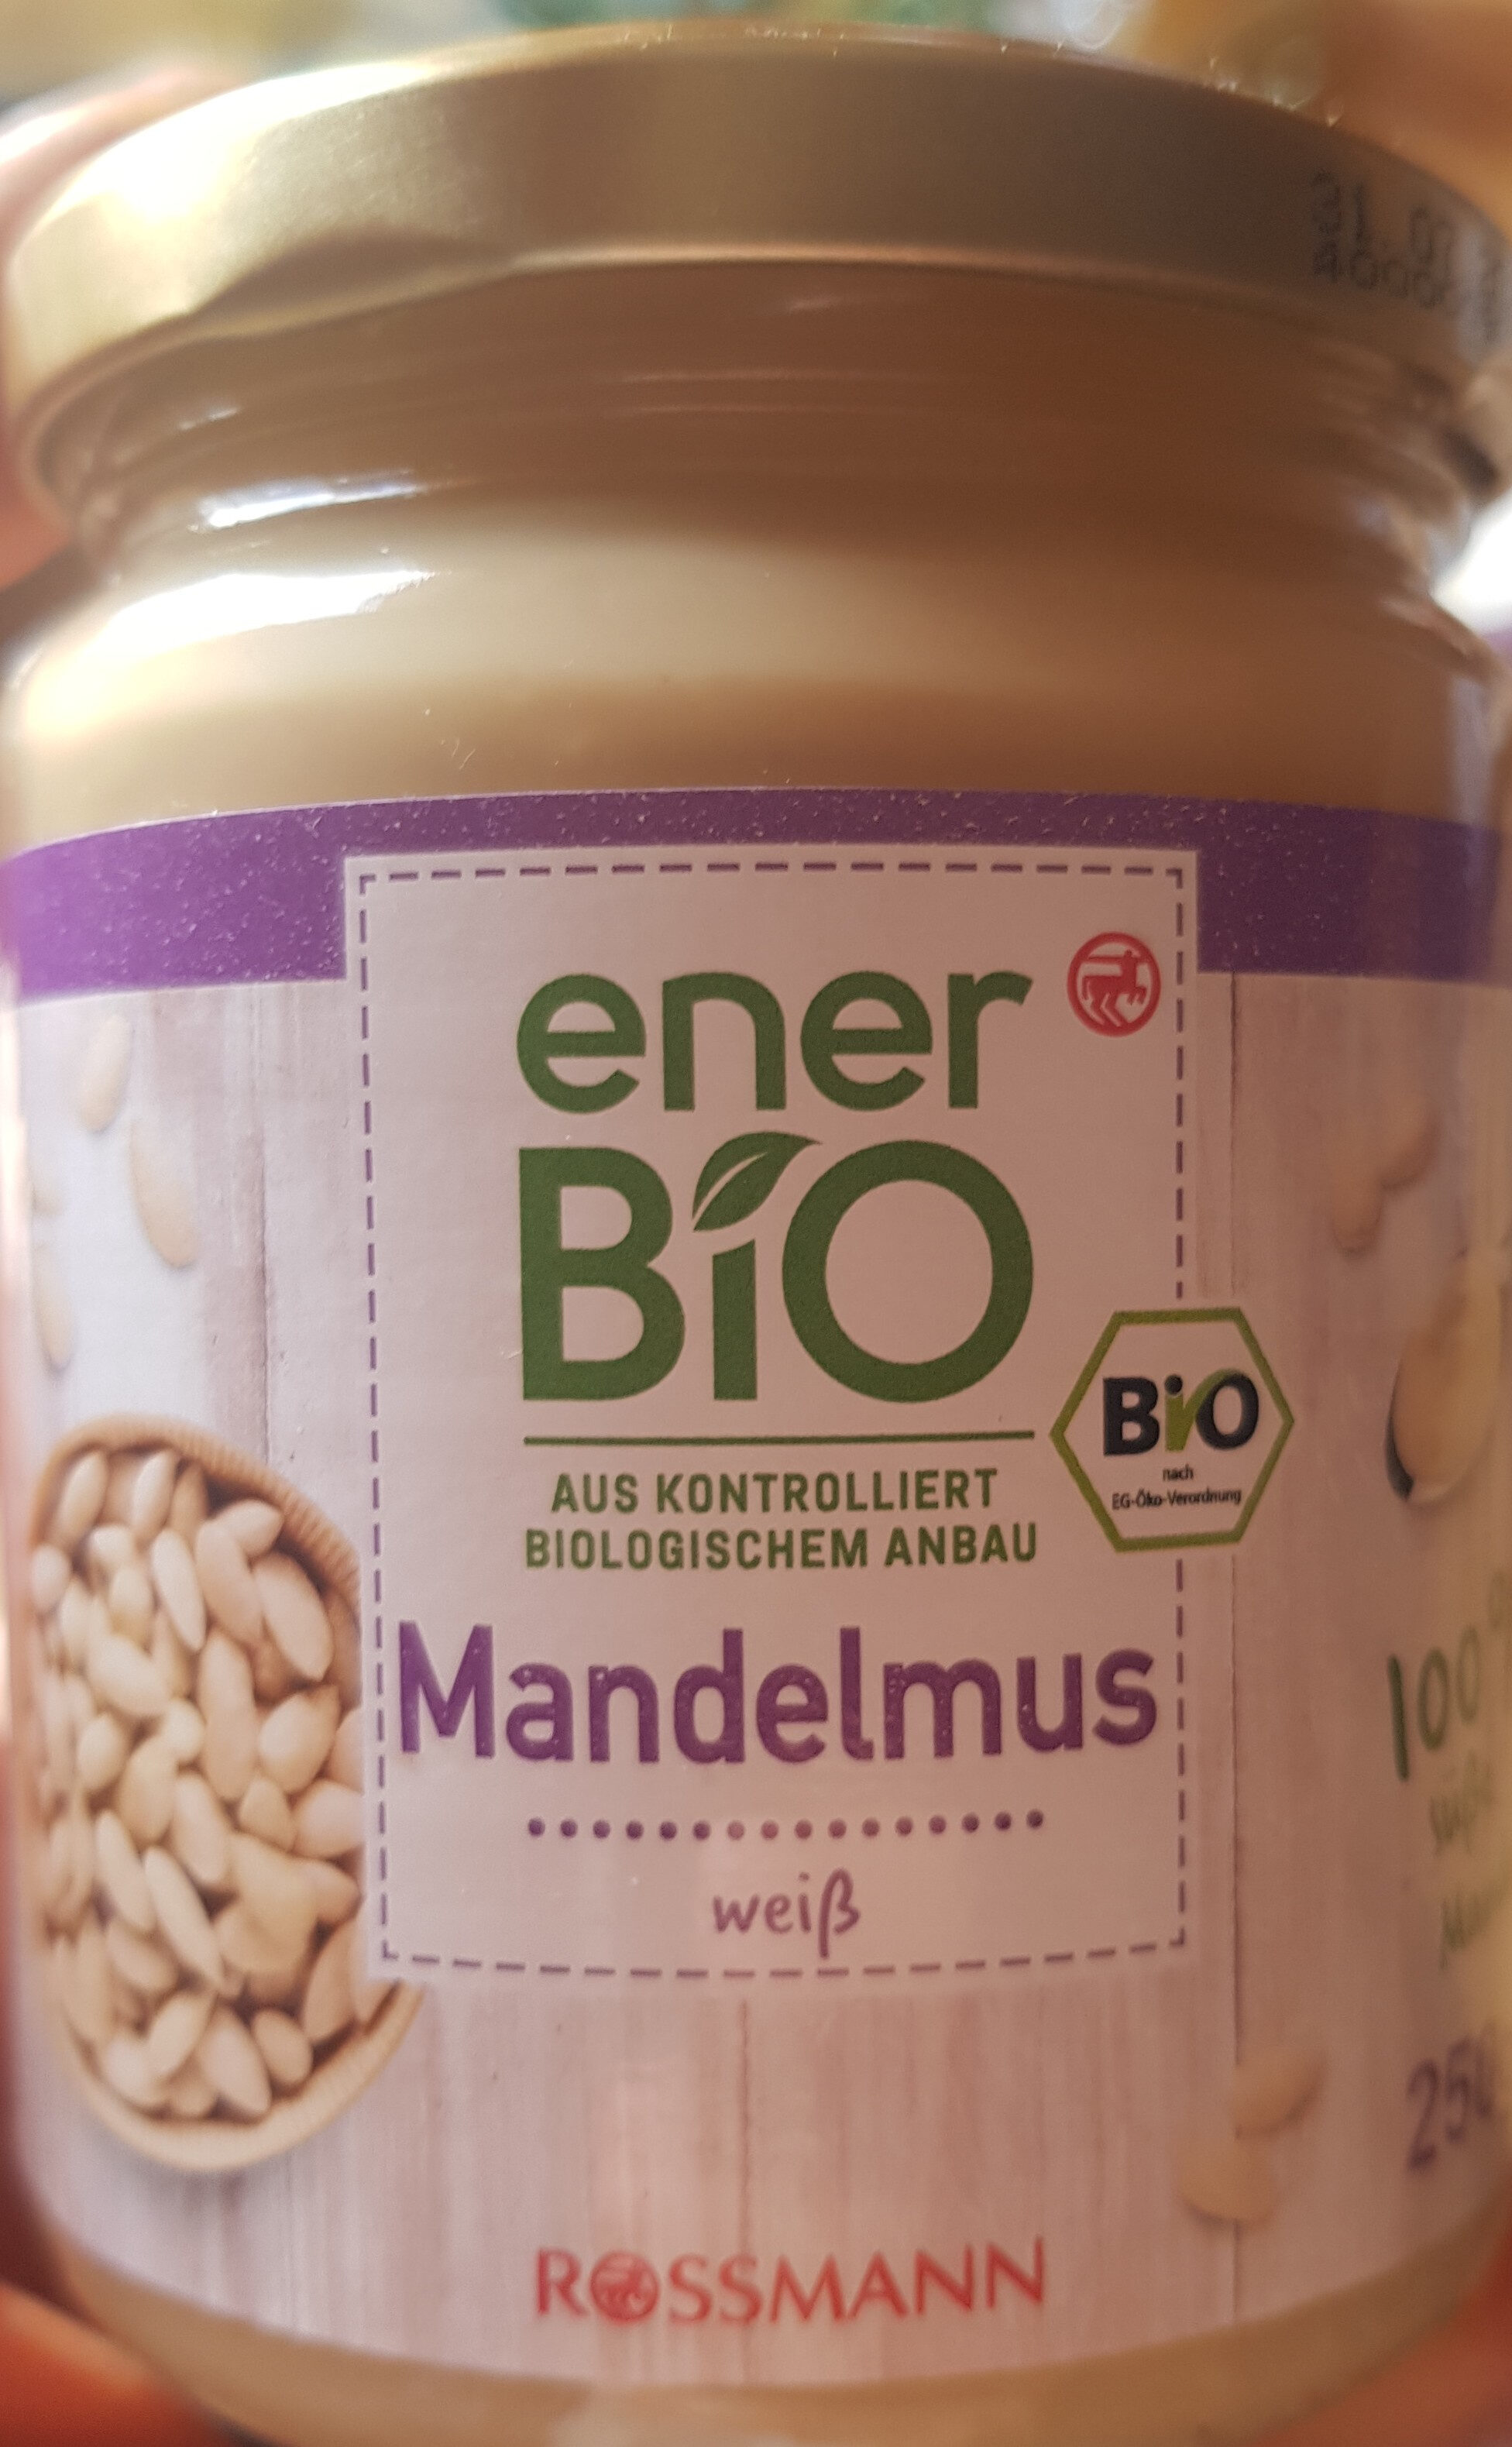 Mandelmus weiß - Produkt - de